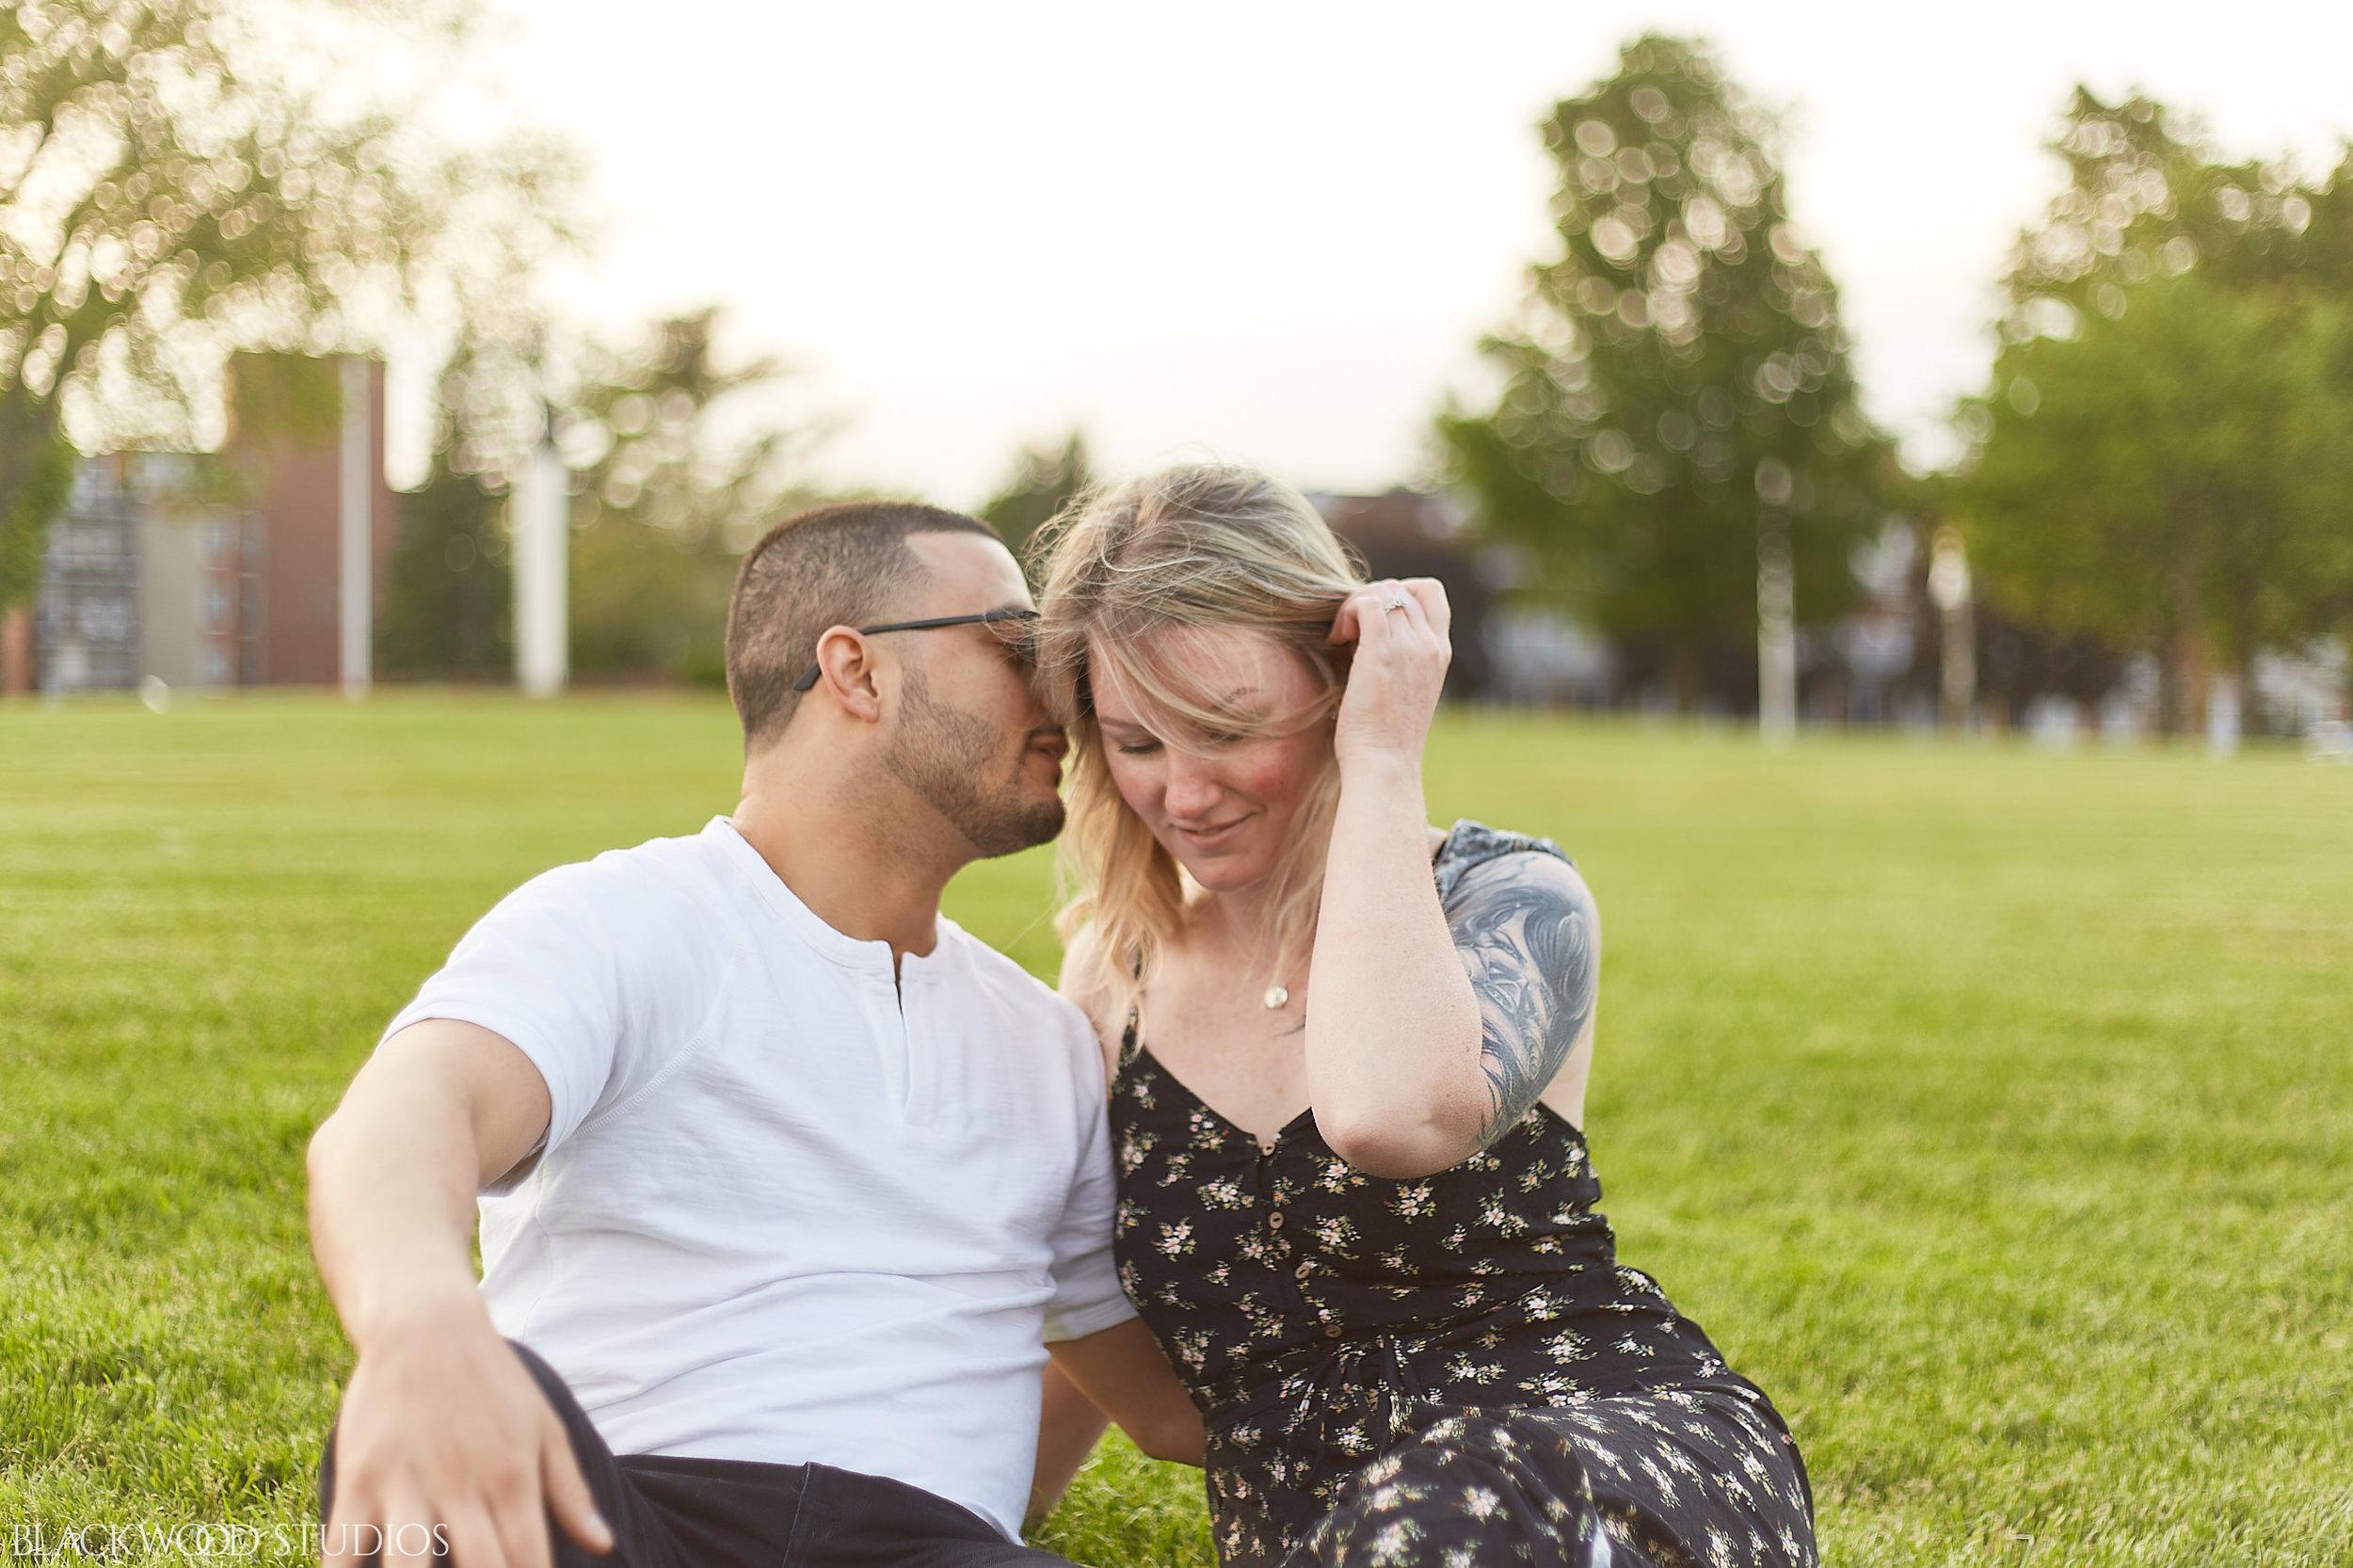 Blackwood-Studios-Photography-20190604195754-Shannon-and-Pedro-Engagement-Spencer-Smith-Park-Burlington-Ontario-Canada.jpg